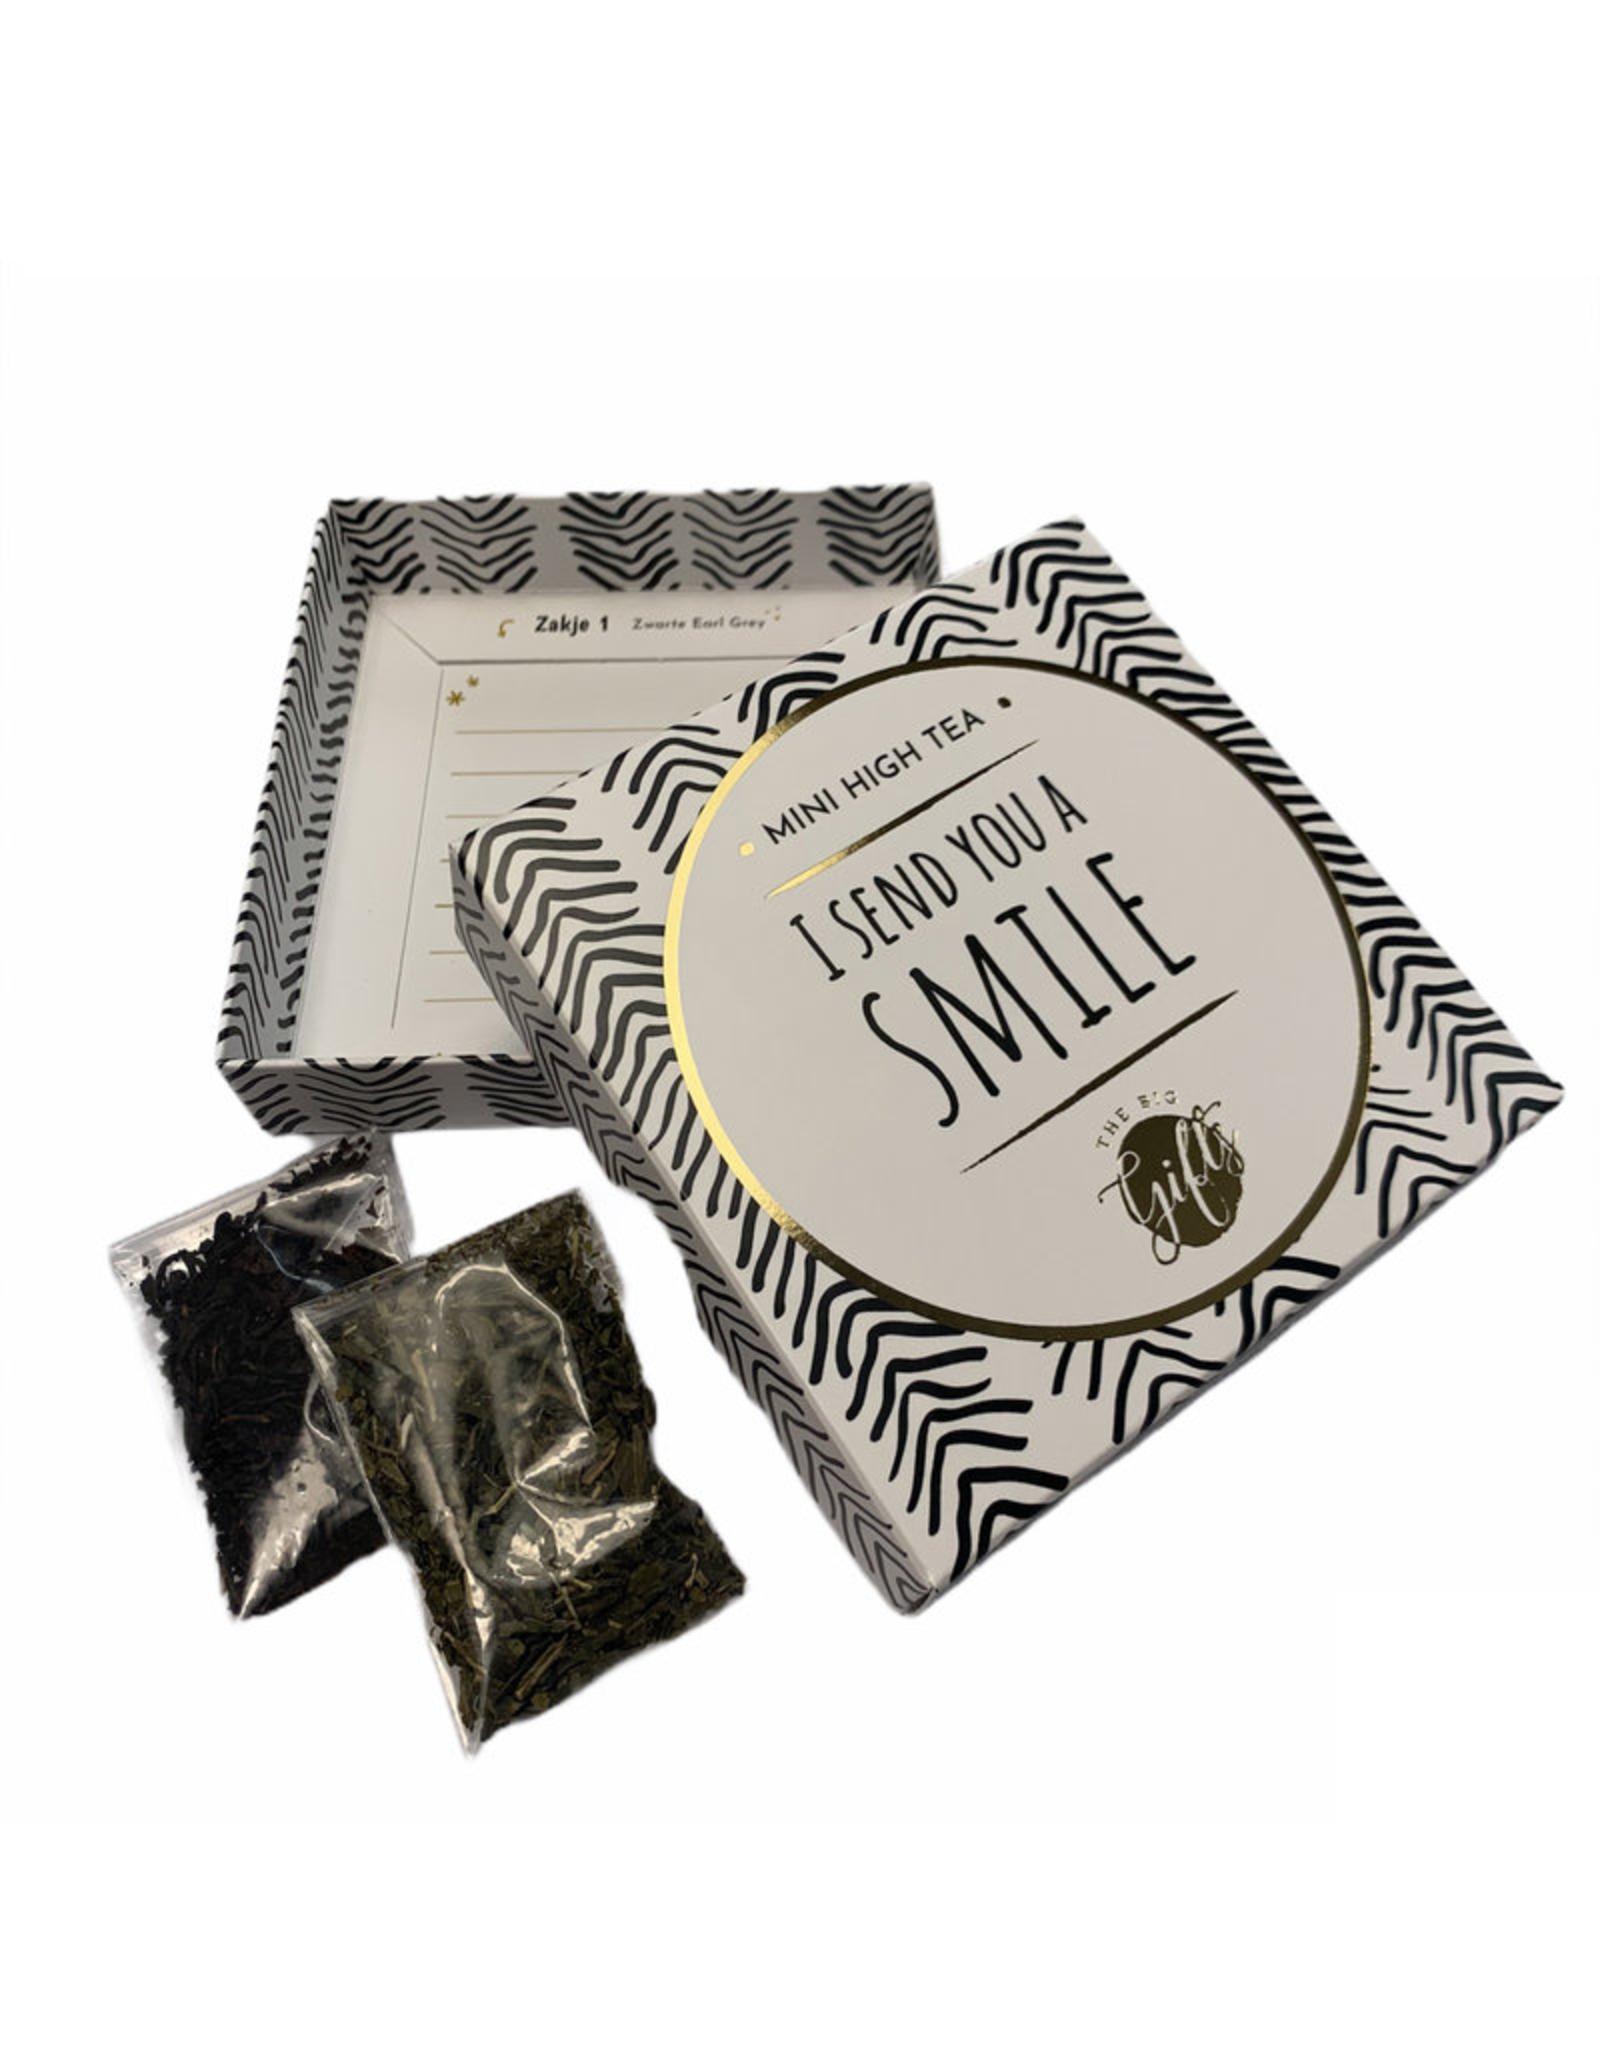 The Big Gifts Kaart en cadeau in een luxe doosje - Mini high tea - I send you a smile - The Big Gifts